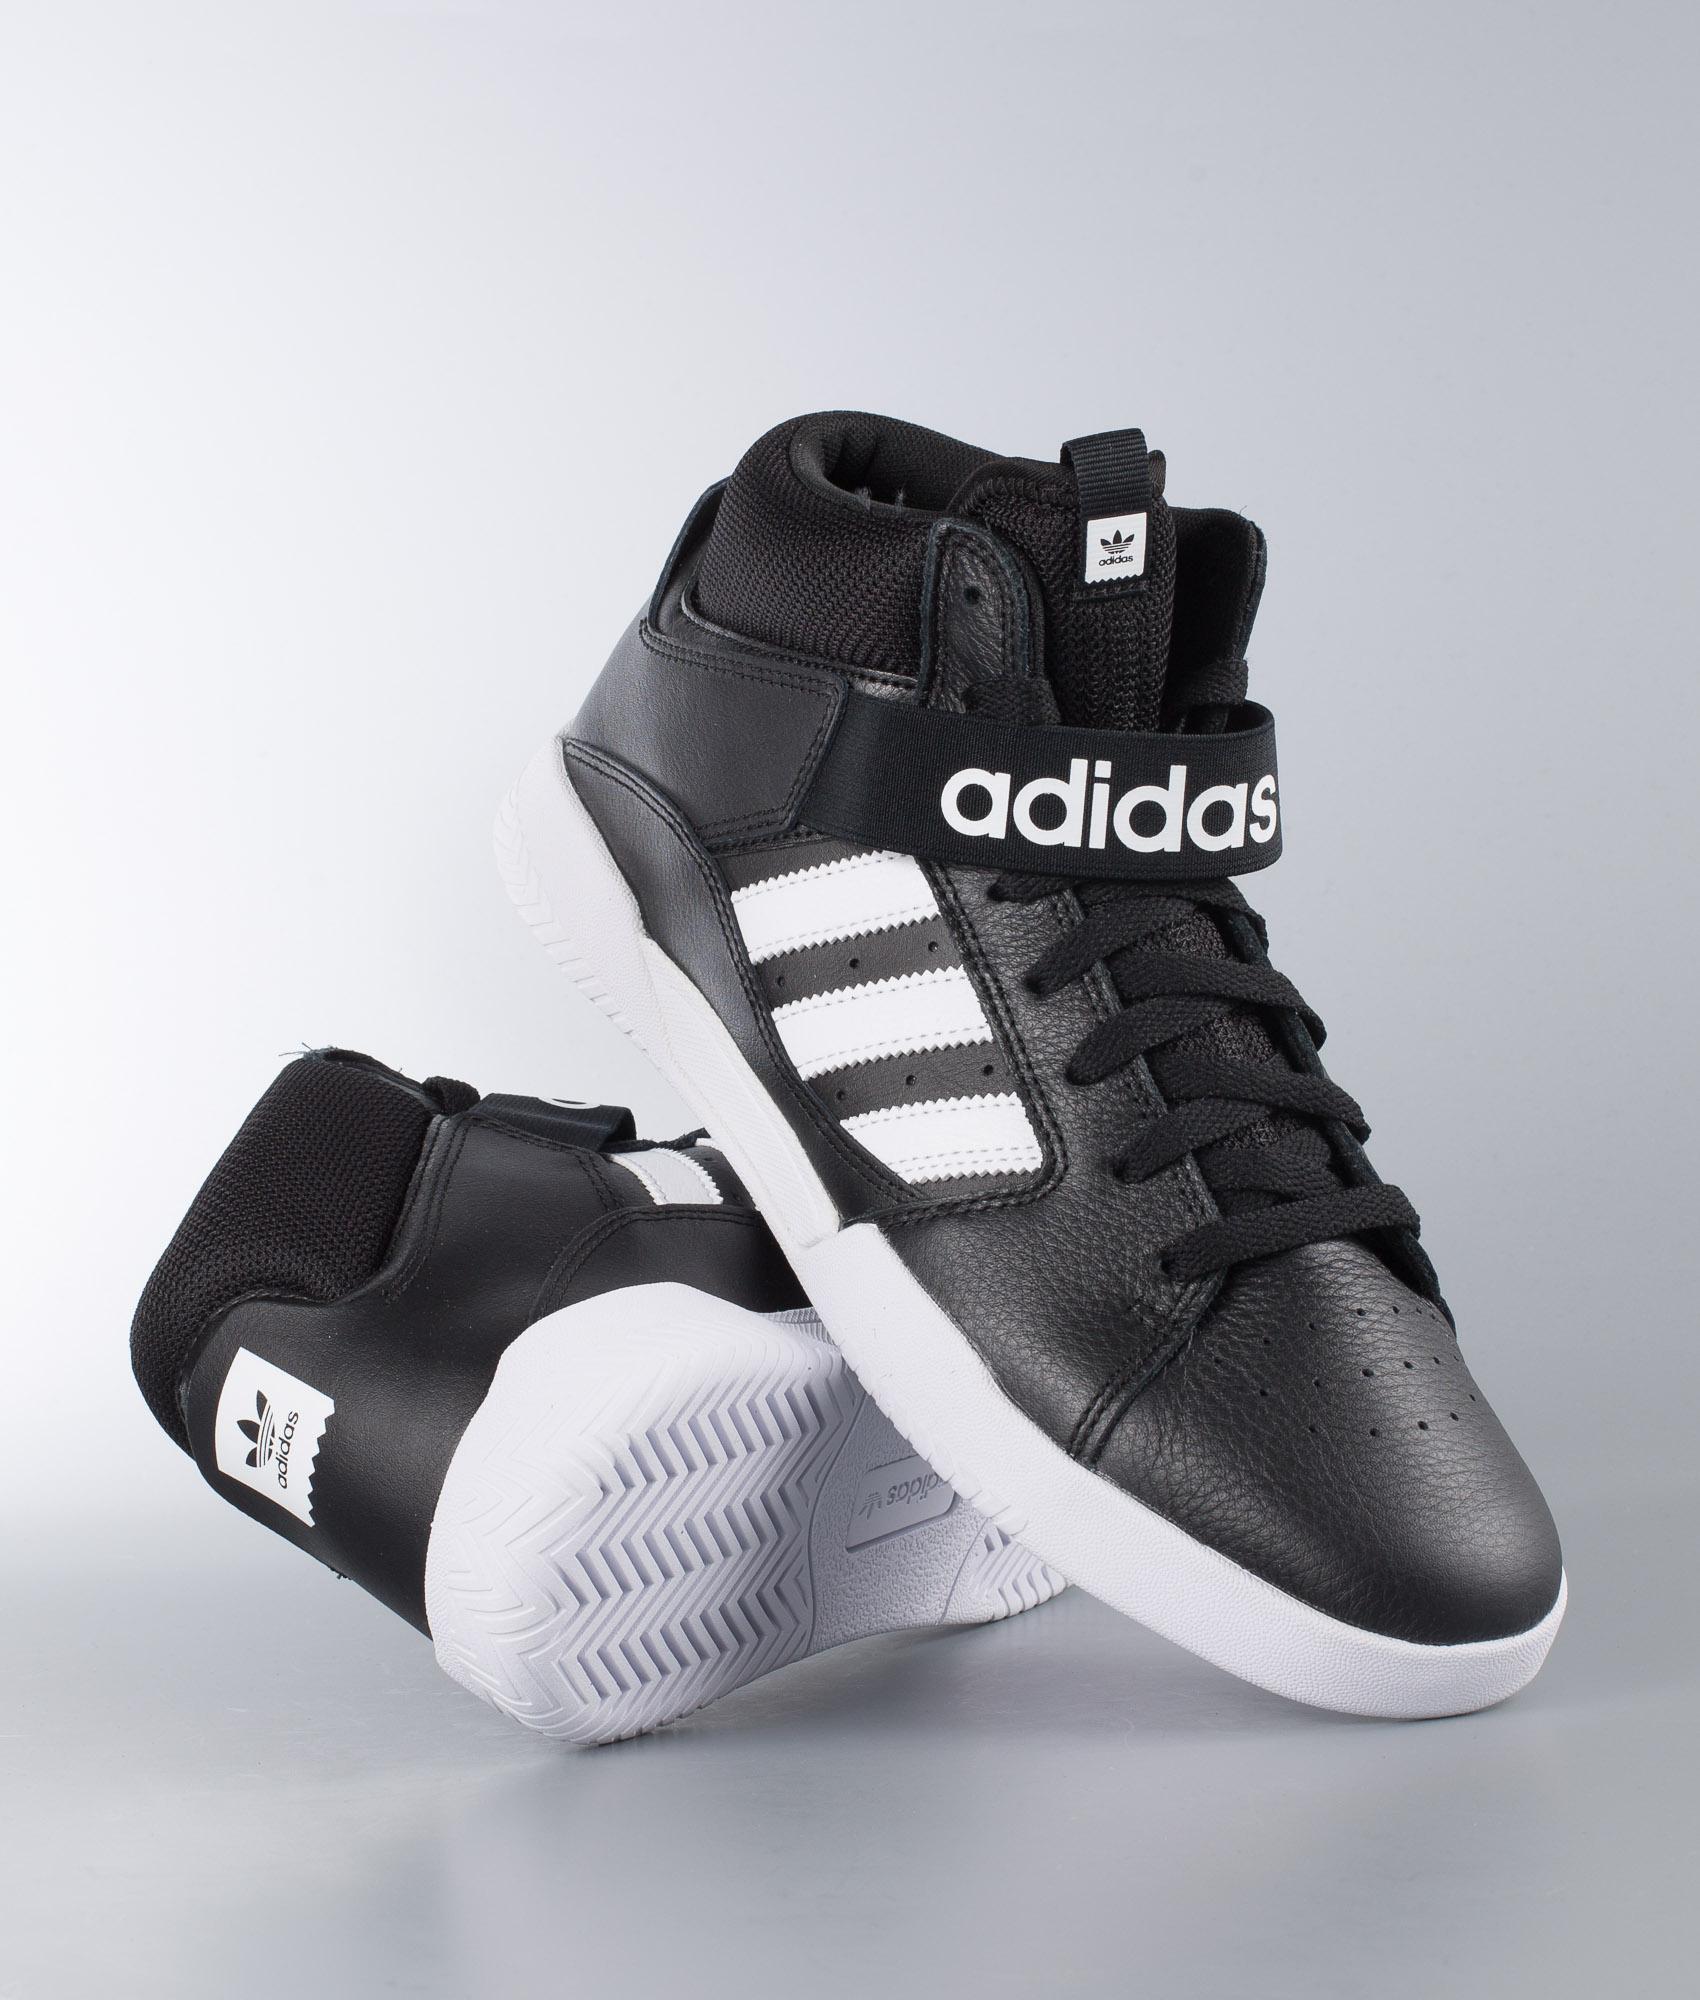 Adidas VRX Mid Skate Shoes Core BlackWhiteWhite  Skate